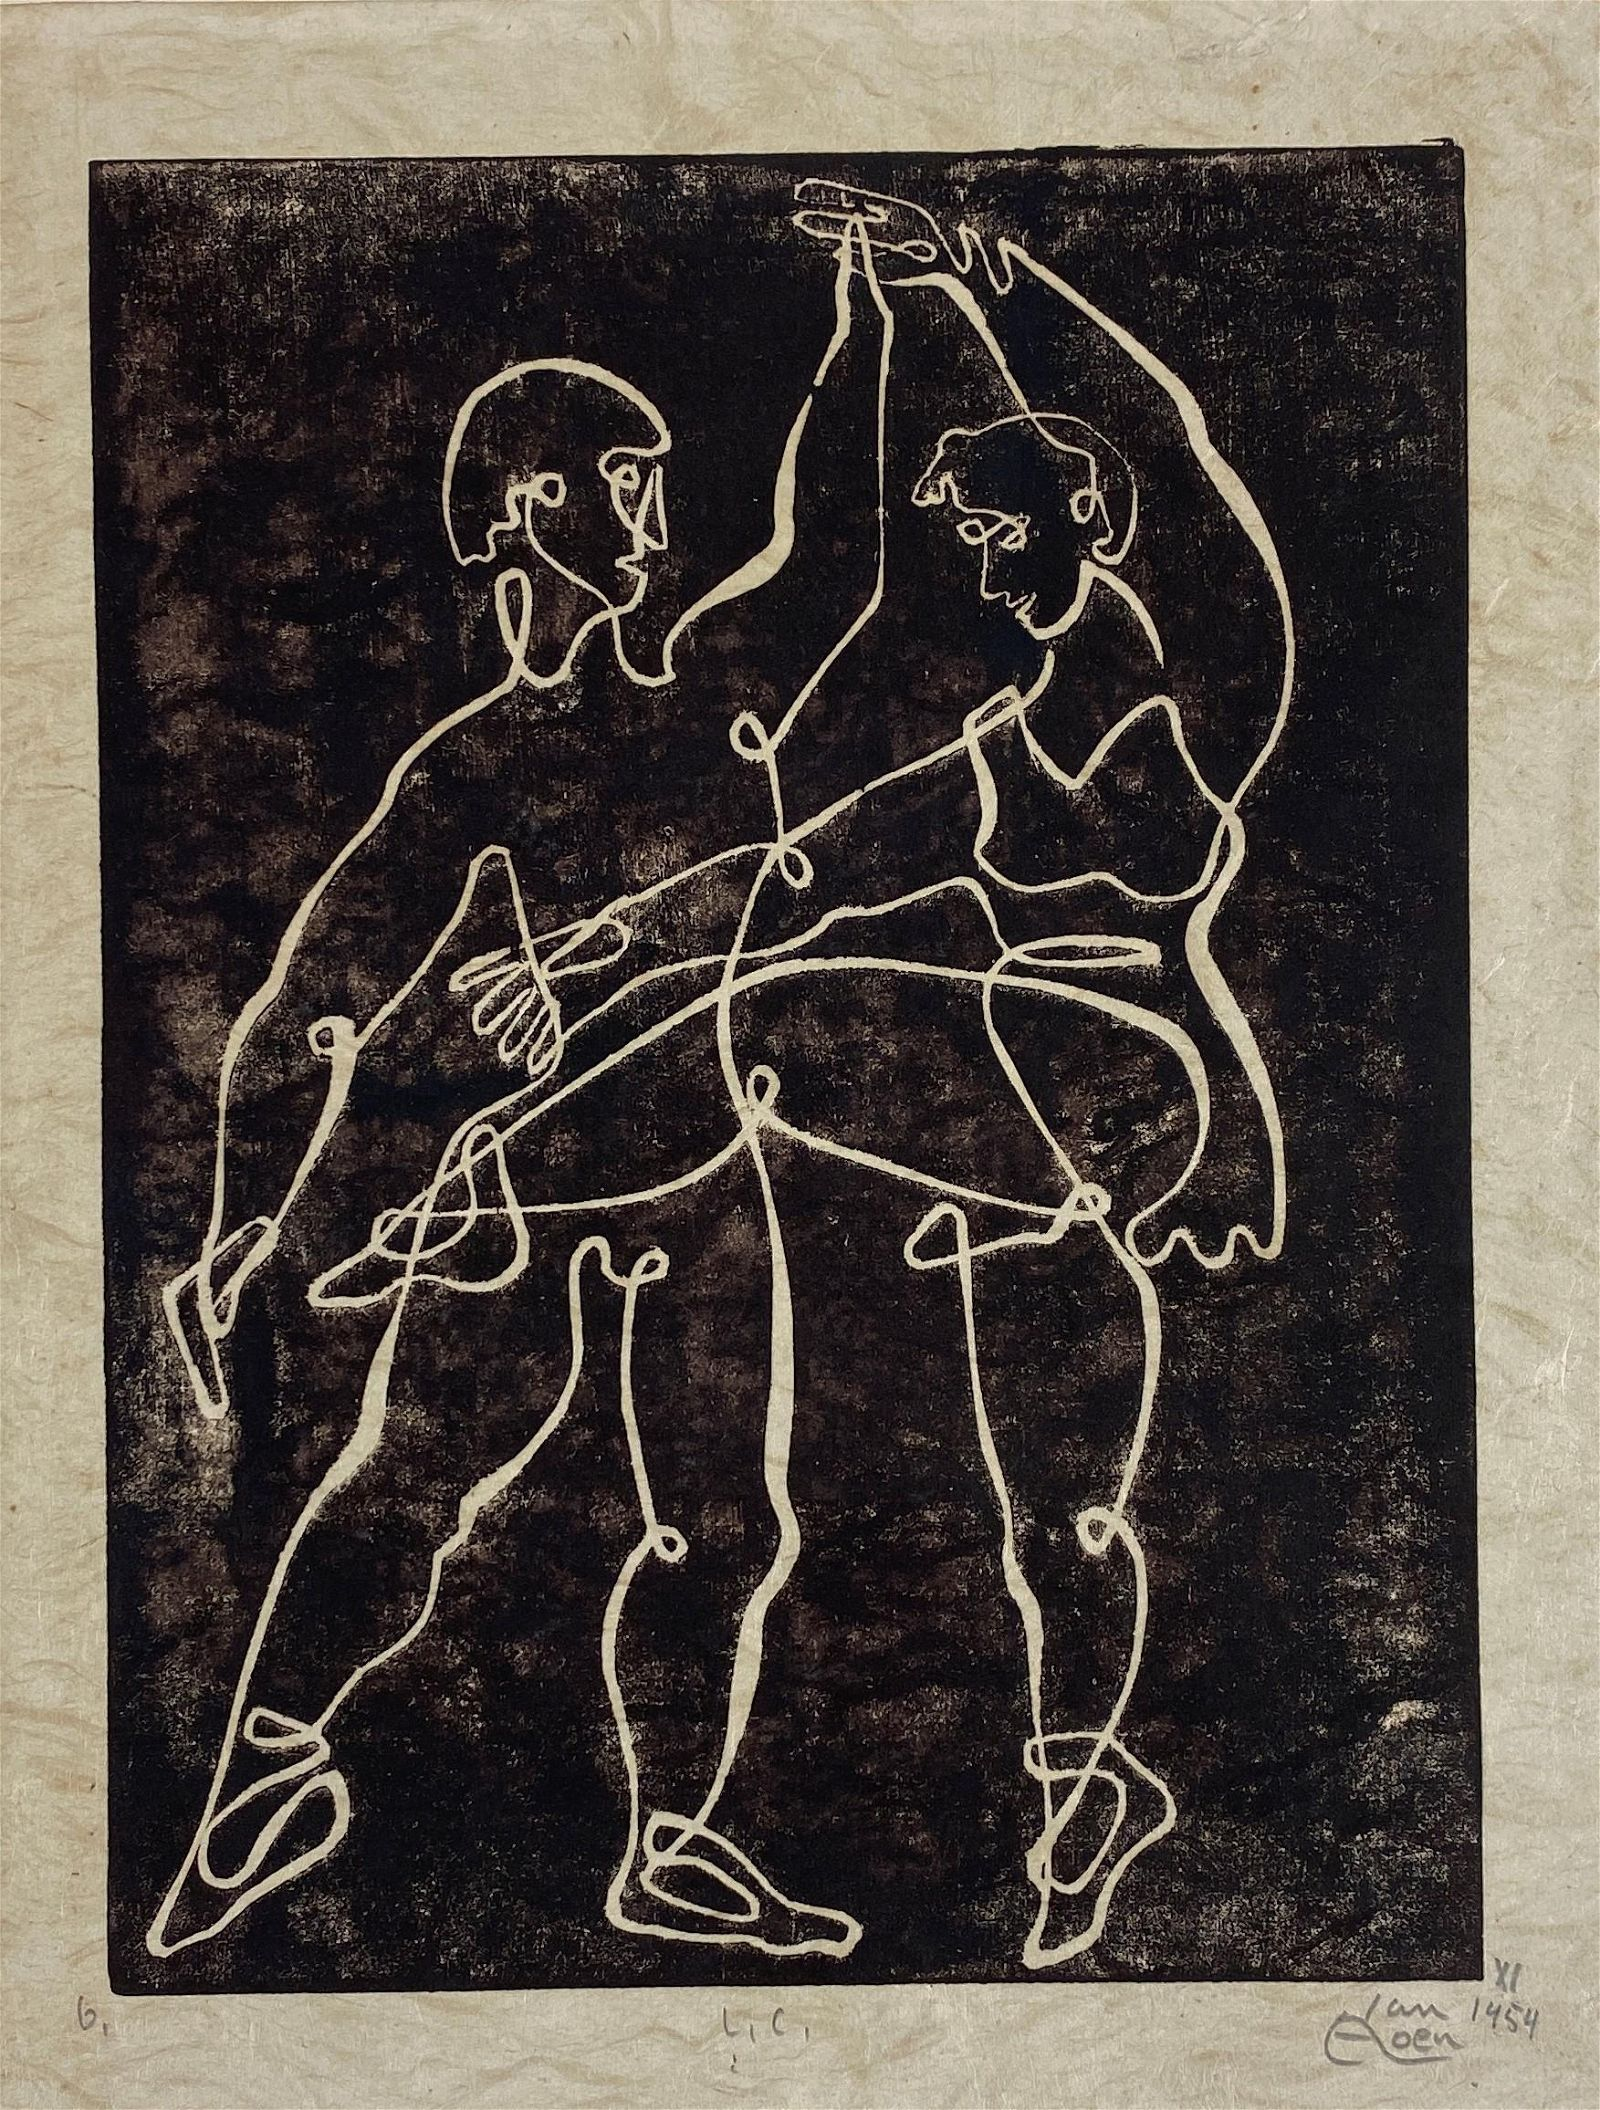 Alfred Van Loen (German, 1924-1993), Linocut